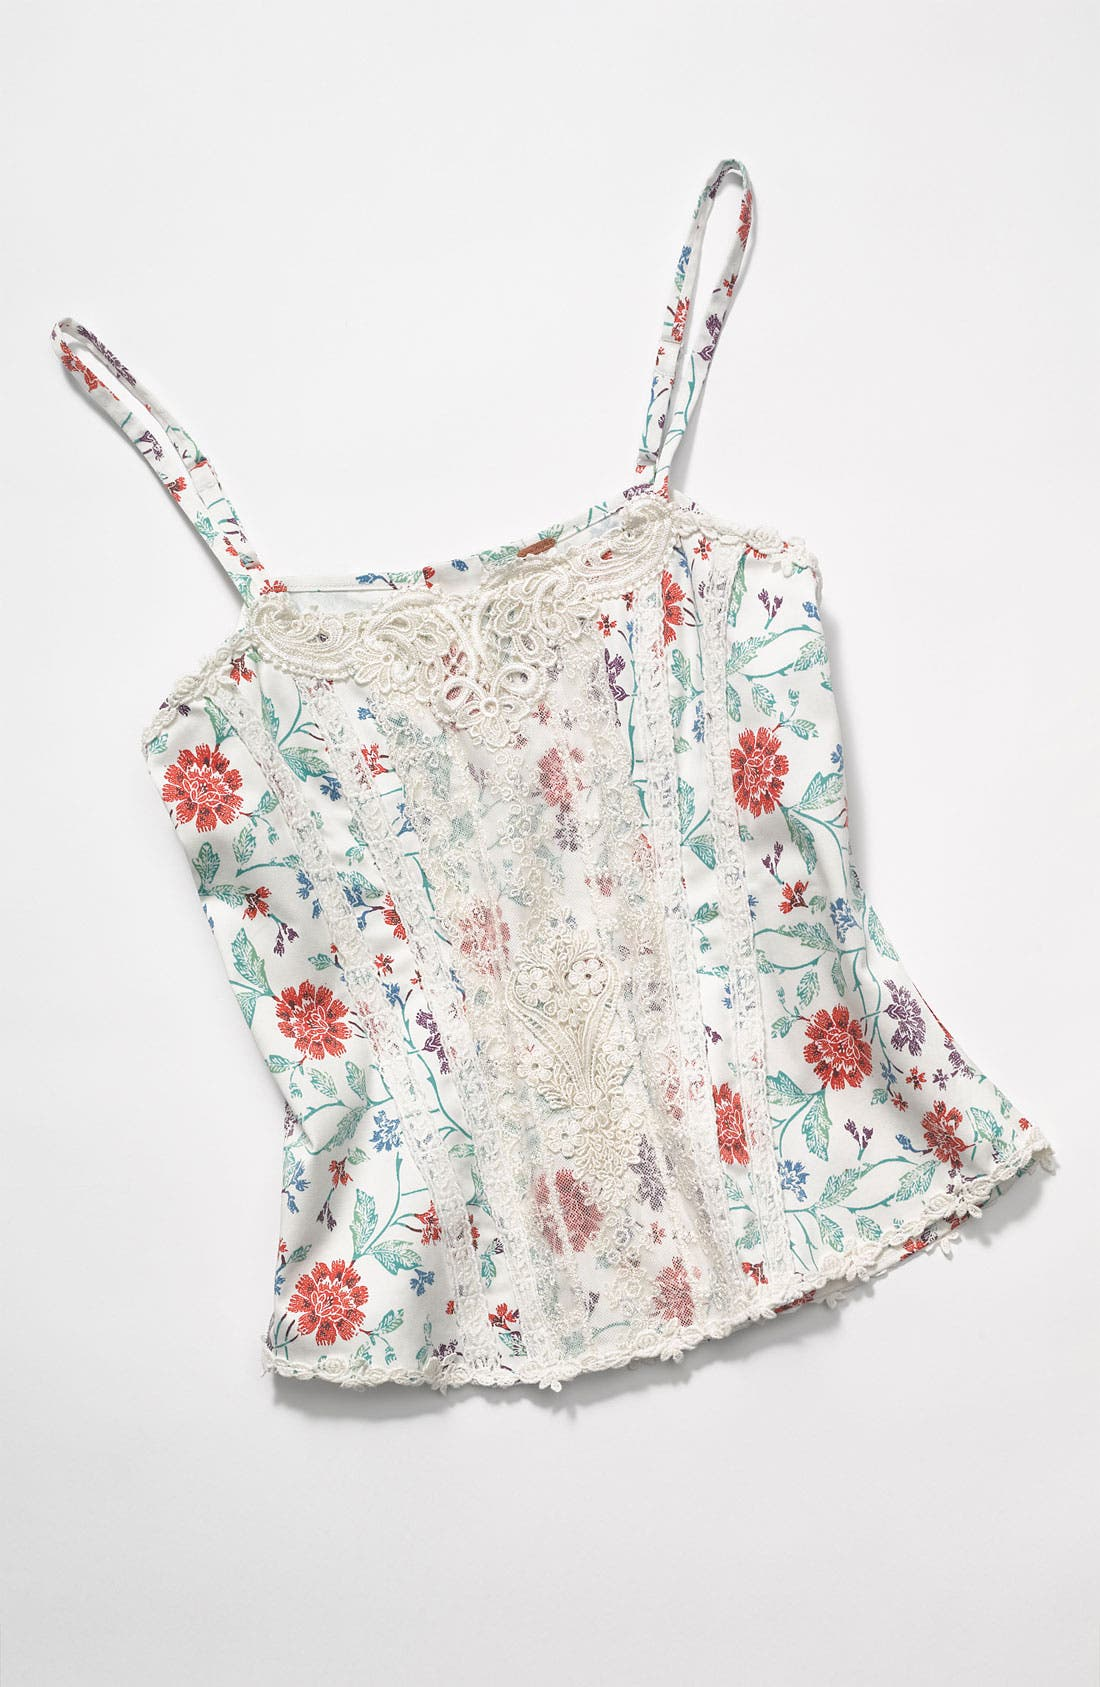 'Miss Lizzy' Floral Corset Camisole,                             Alternate thumbnail 4, color,                             900